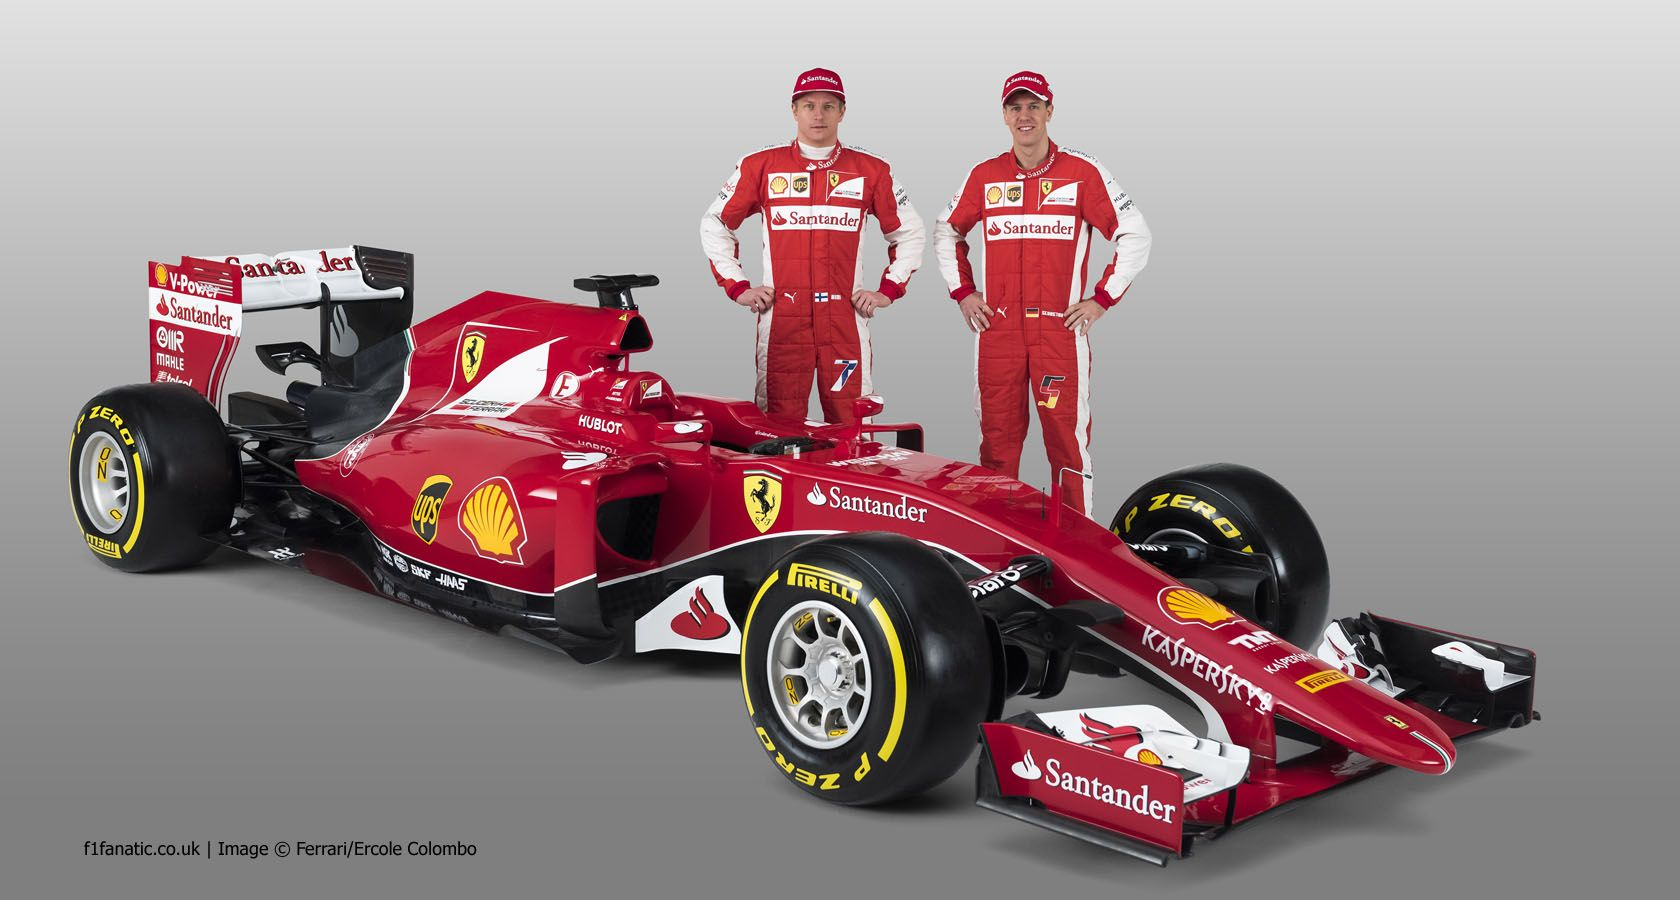 Download Ferrari Wallpaper F1 2015  Background